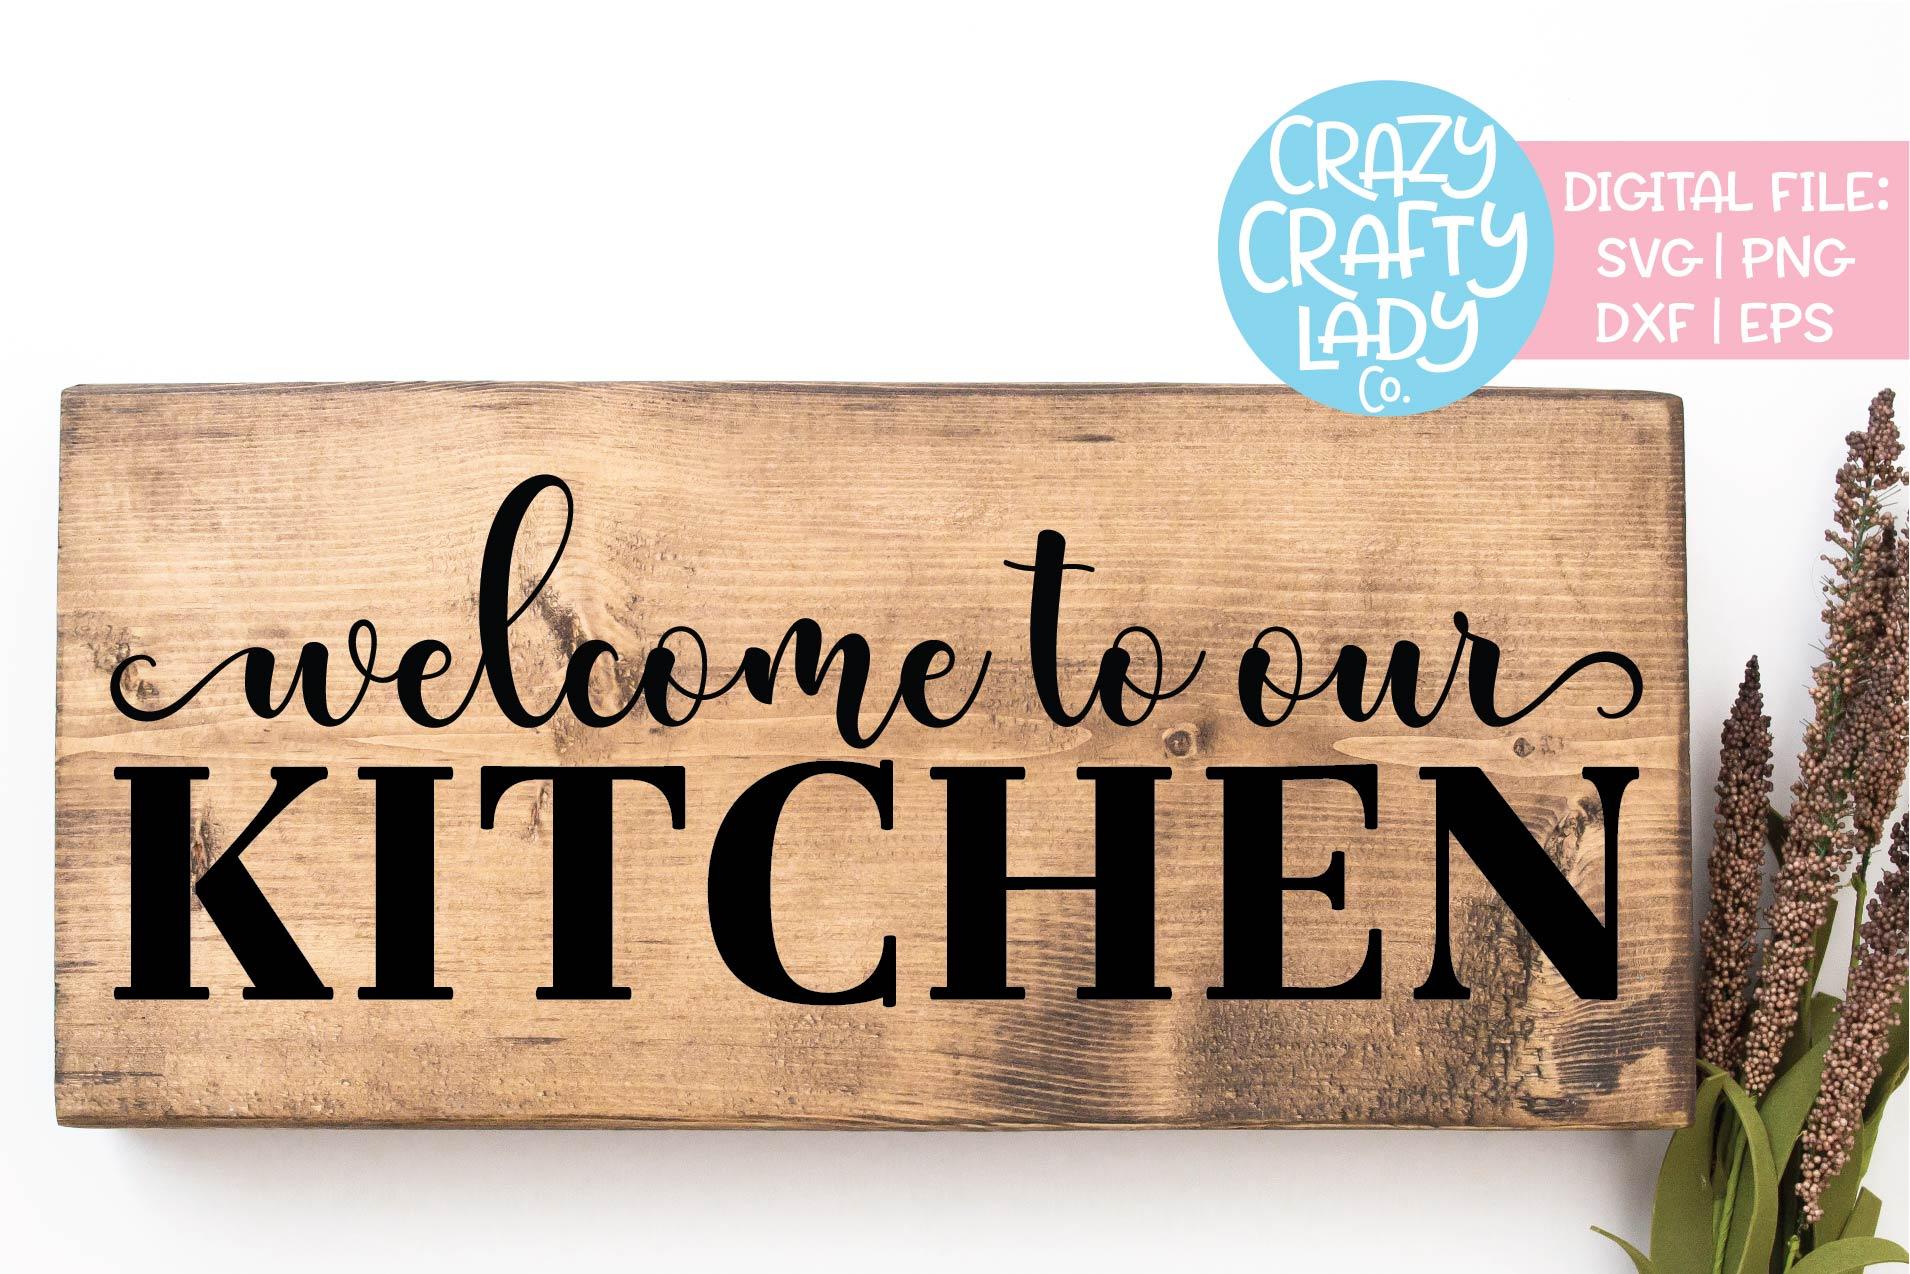 Kitchen Sign SVG DXF EPS PNG Cut File Bundle example image 3